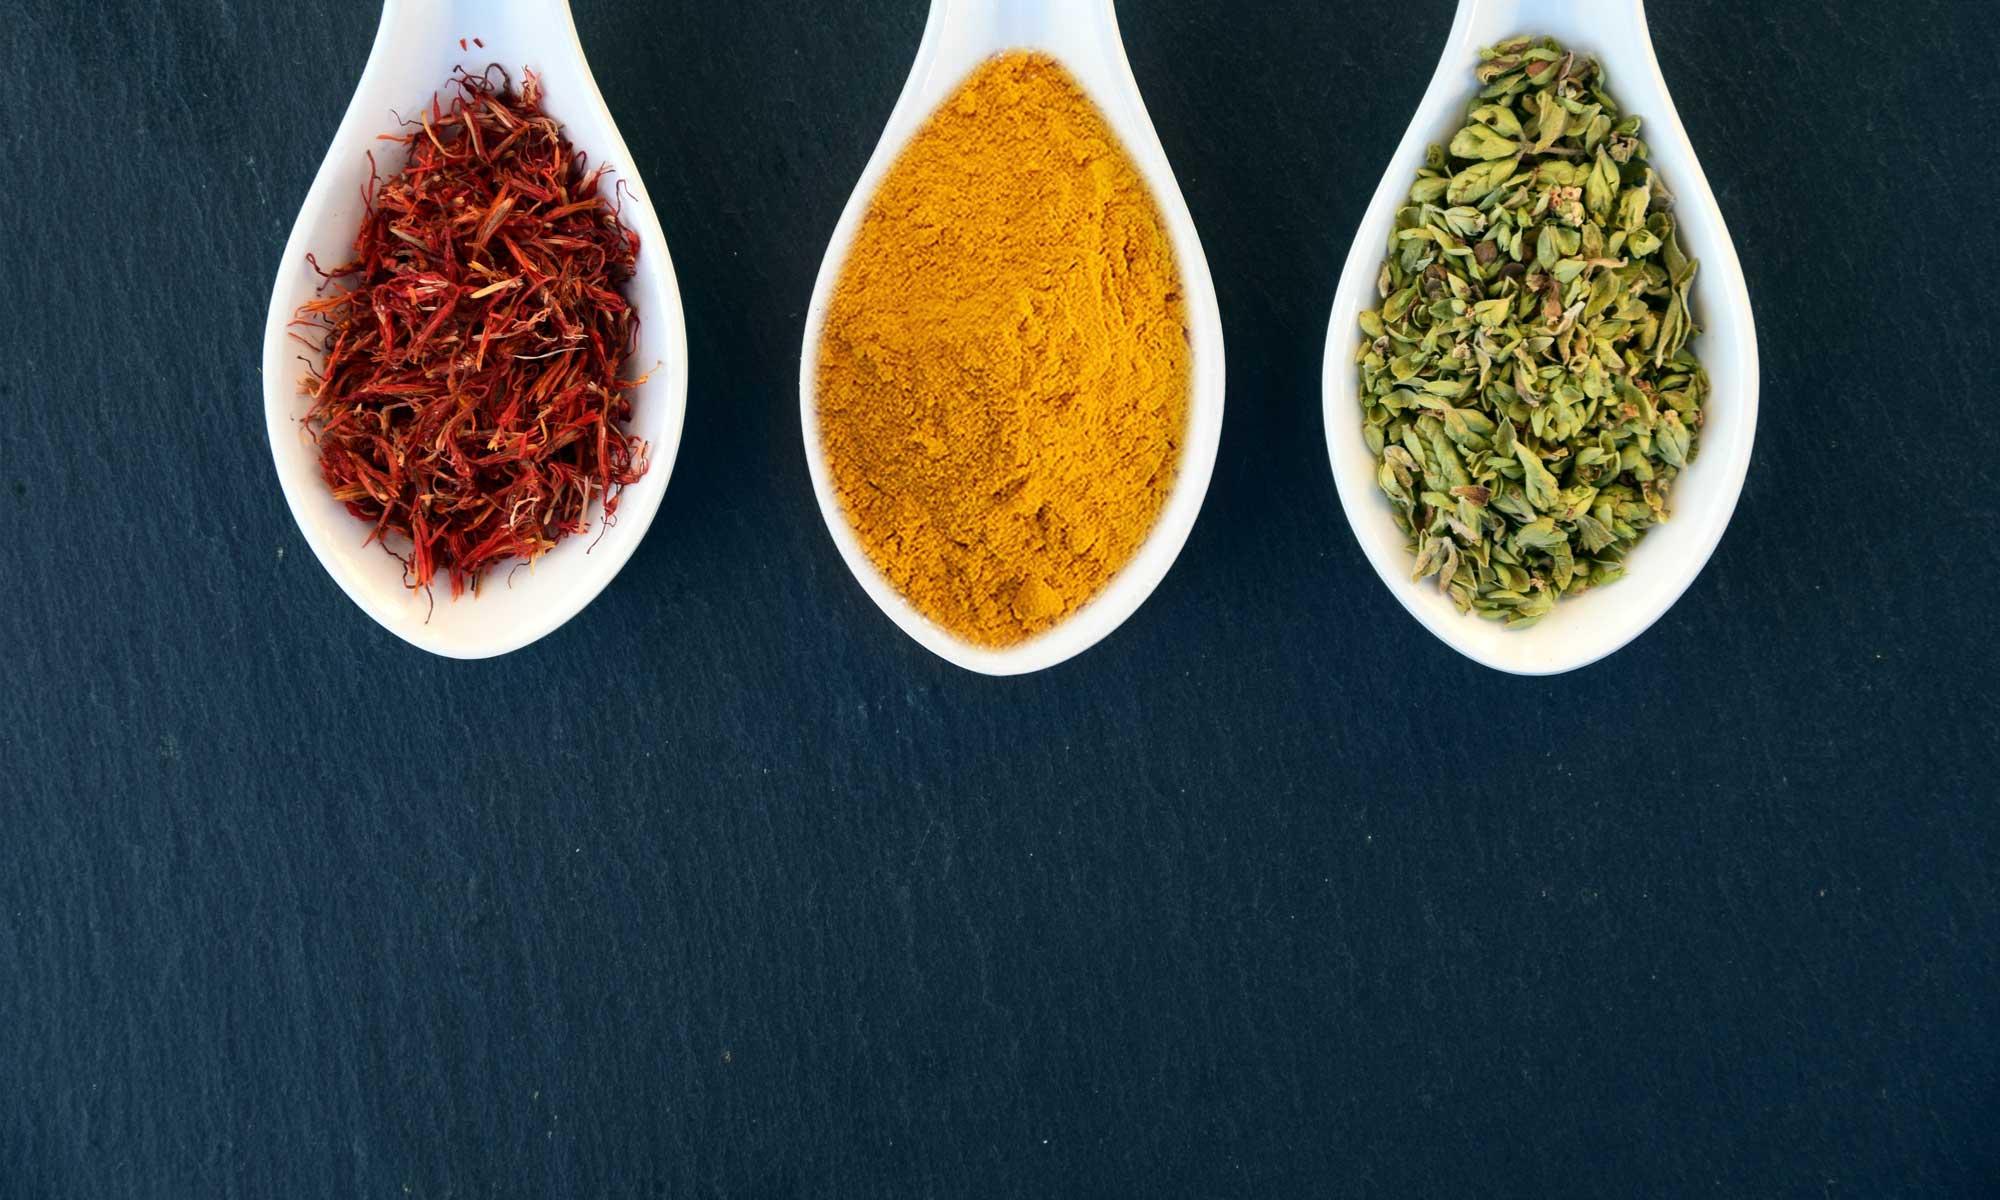 Anita Vigl | Individuelle Ernährungsberatung & Kochkurse